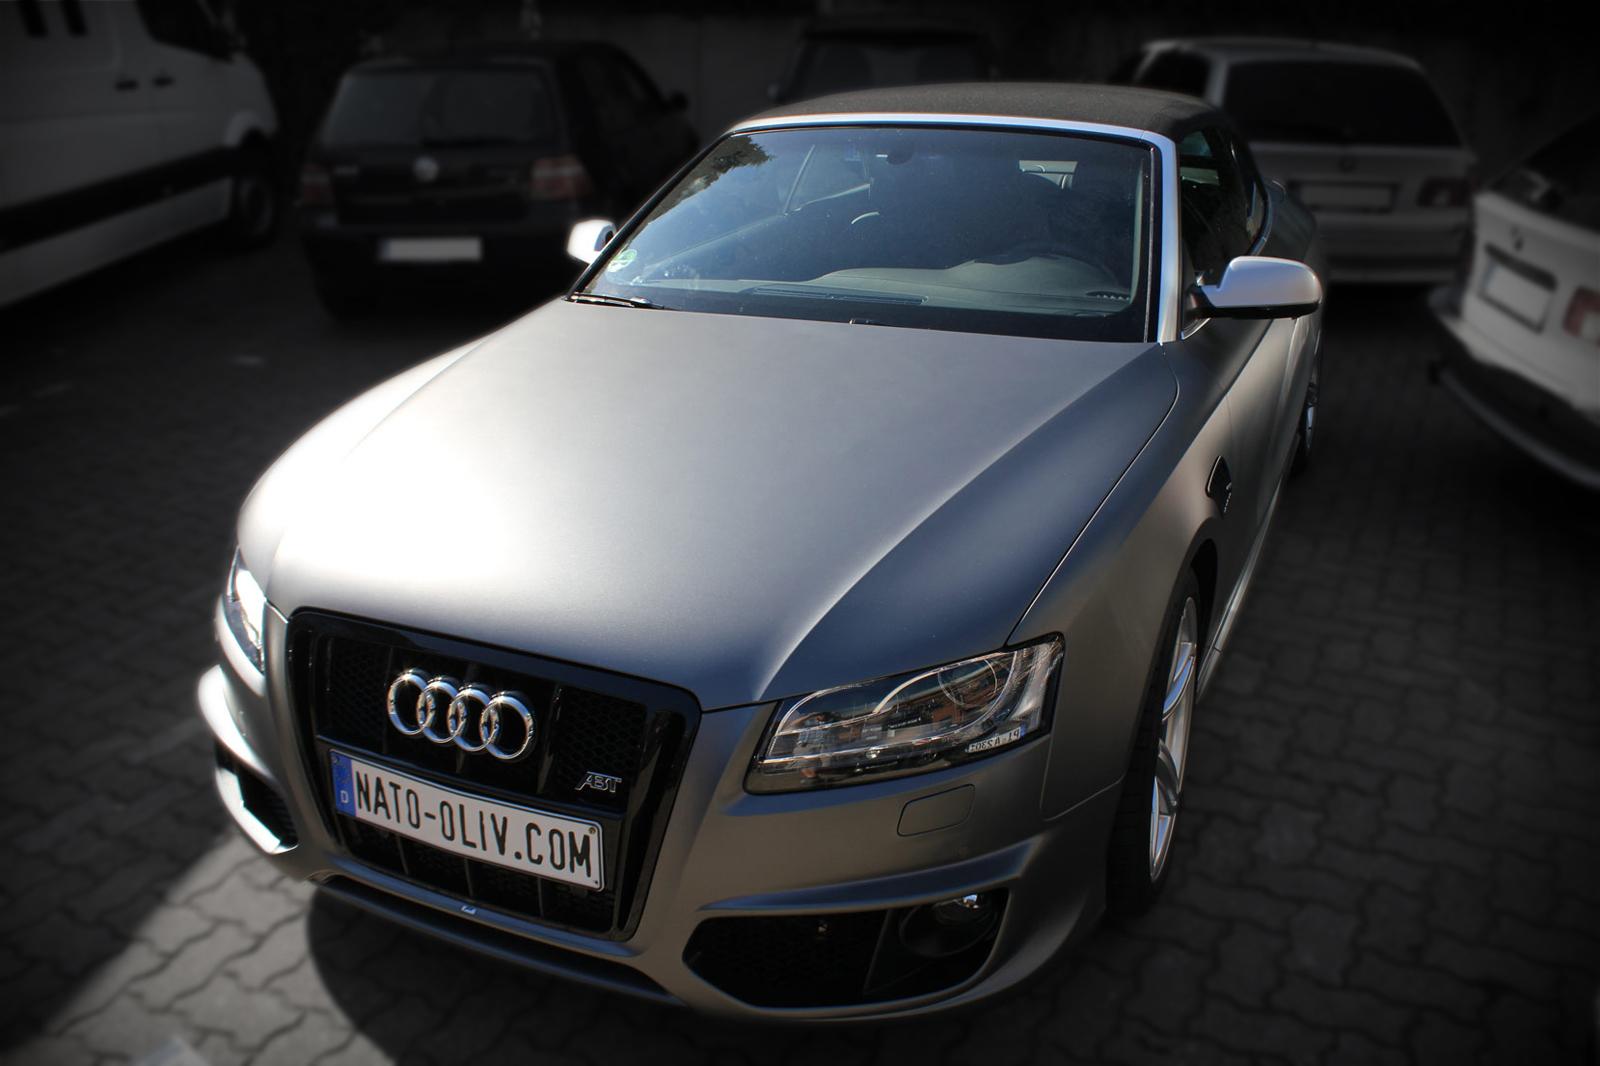 Audi_A5_Cabrio_ABT_Anthrazit_Matt_Metallic_Titelbild